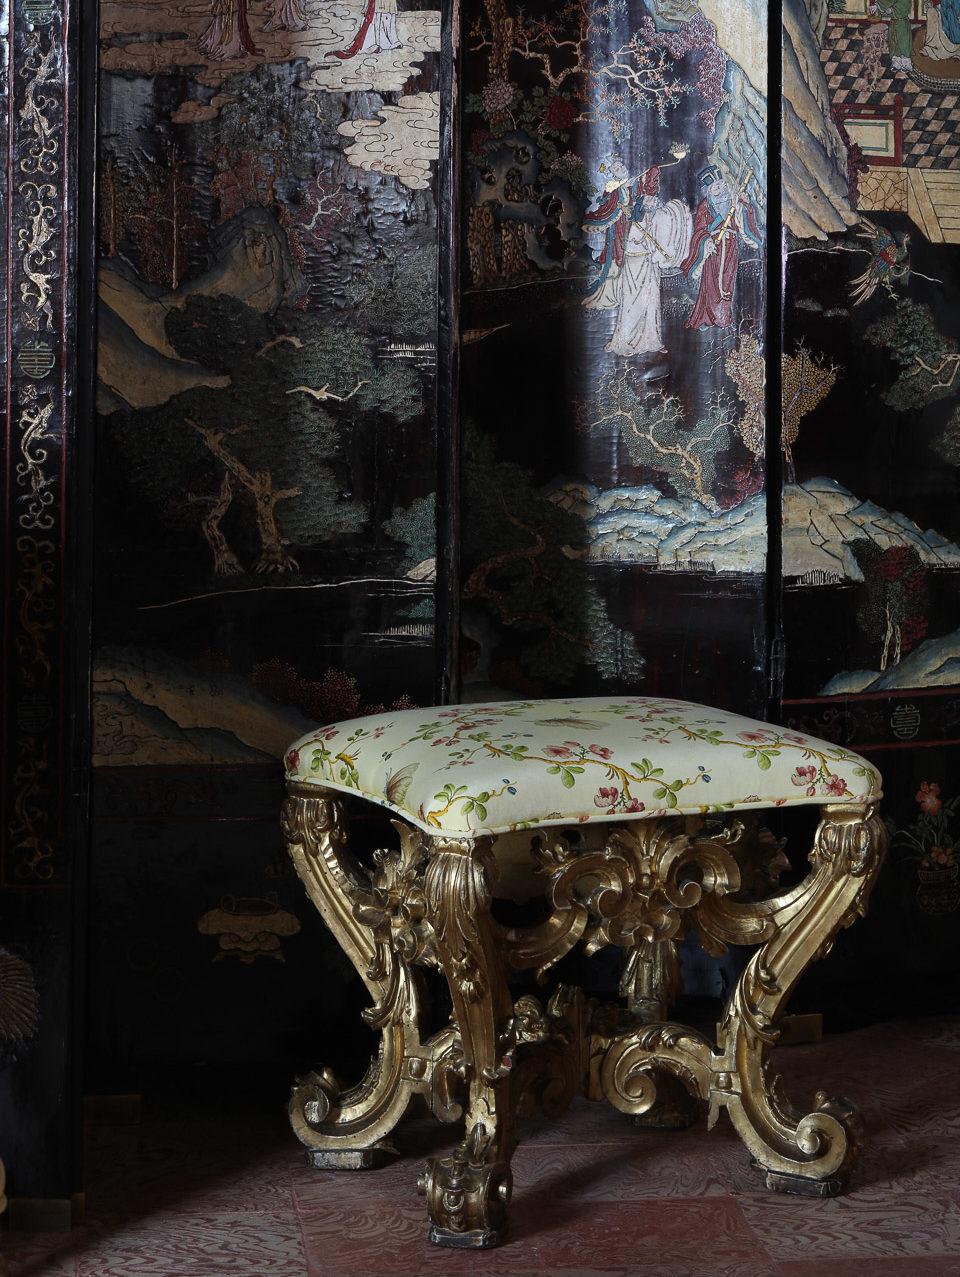 Villa Balbiano luxury property Lake Como Milan Italy classic best interiors exquisite suites bedrooms lavish decor decoraion impecable service frescos e1573583771549